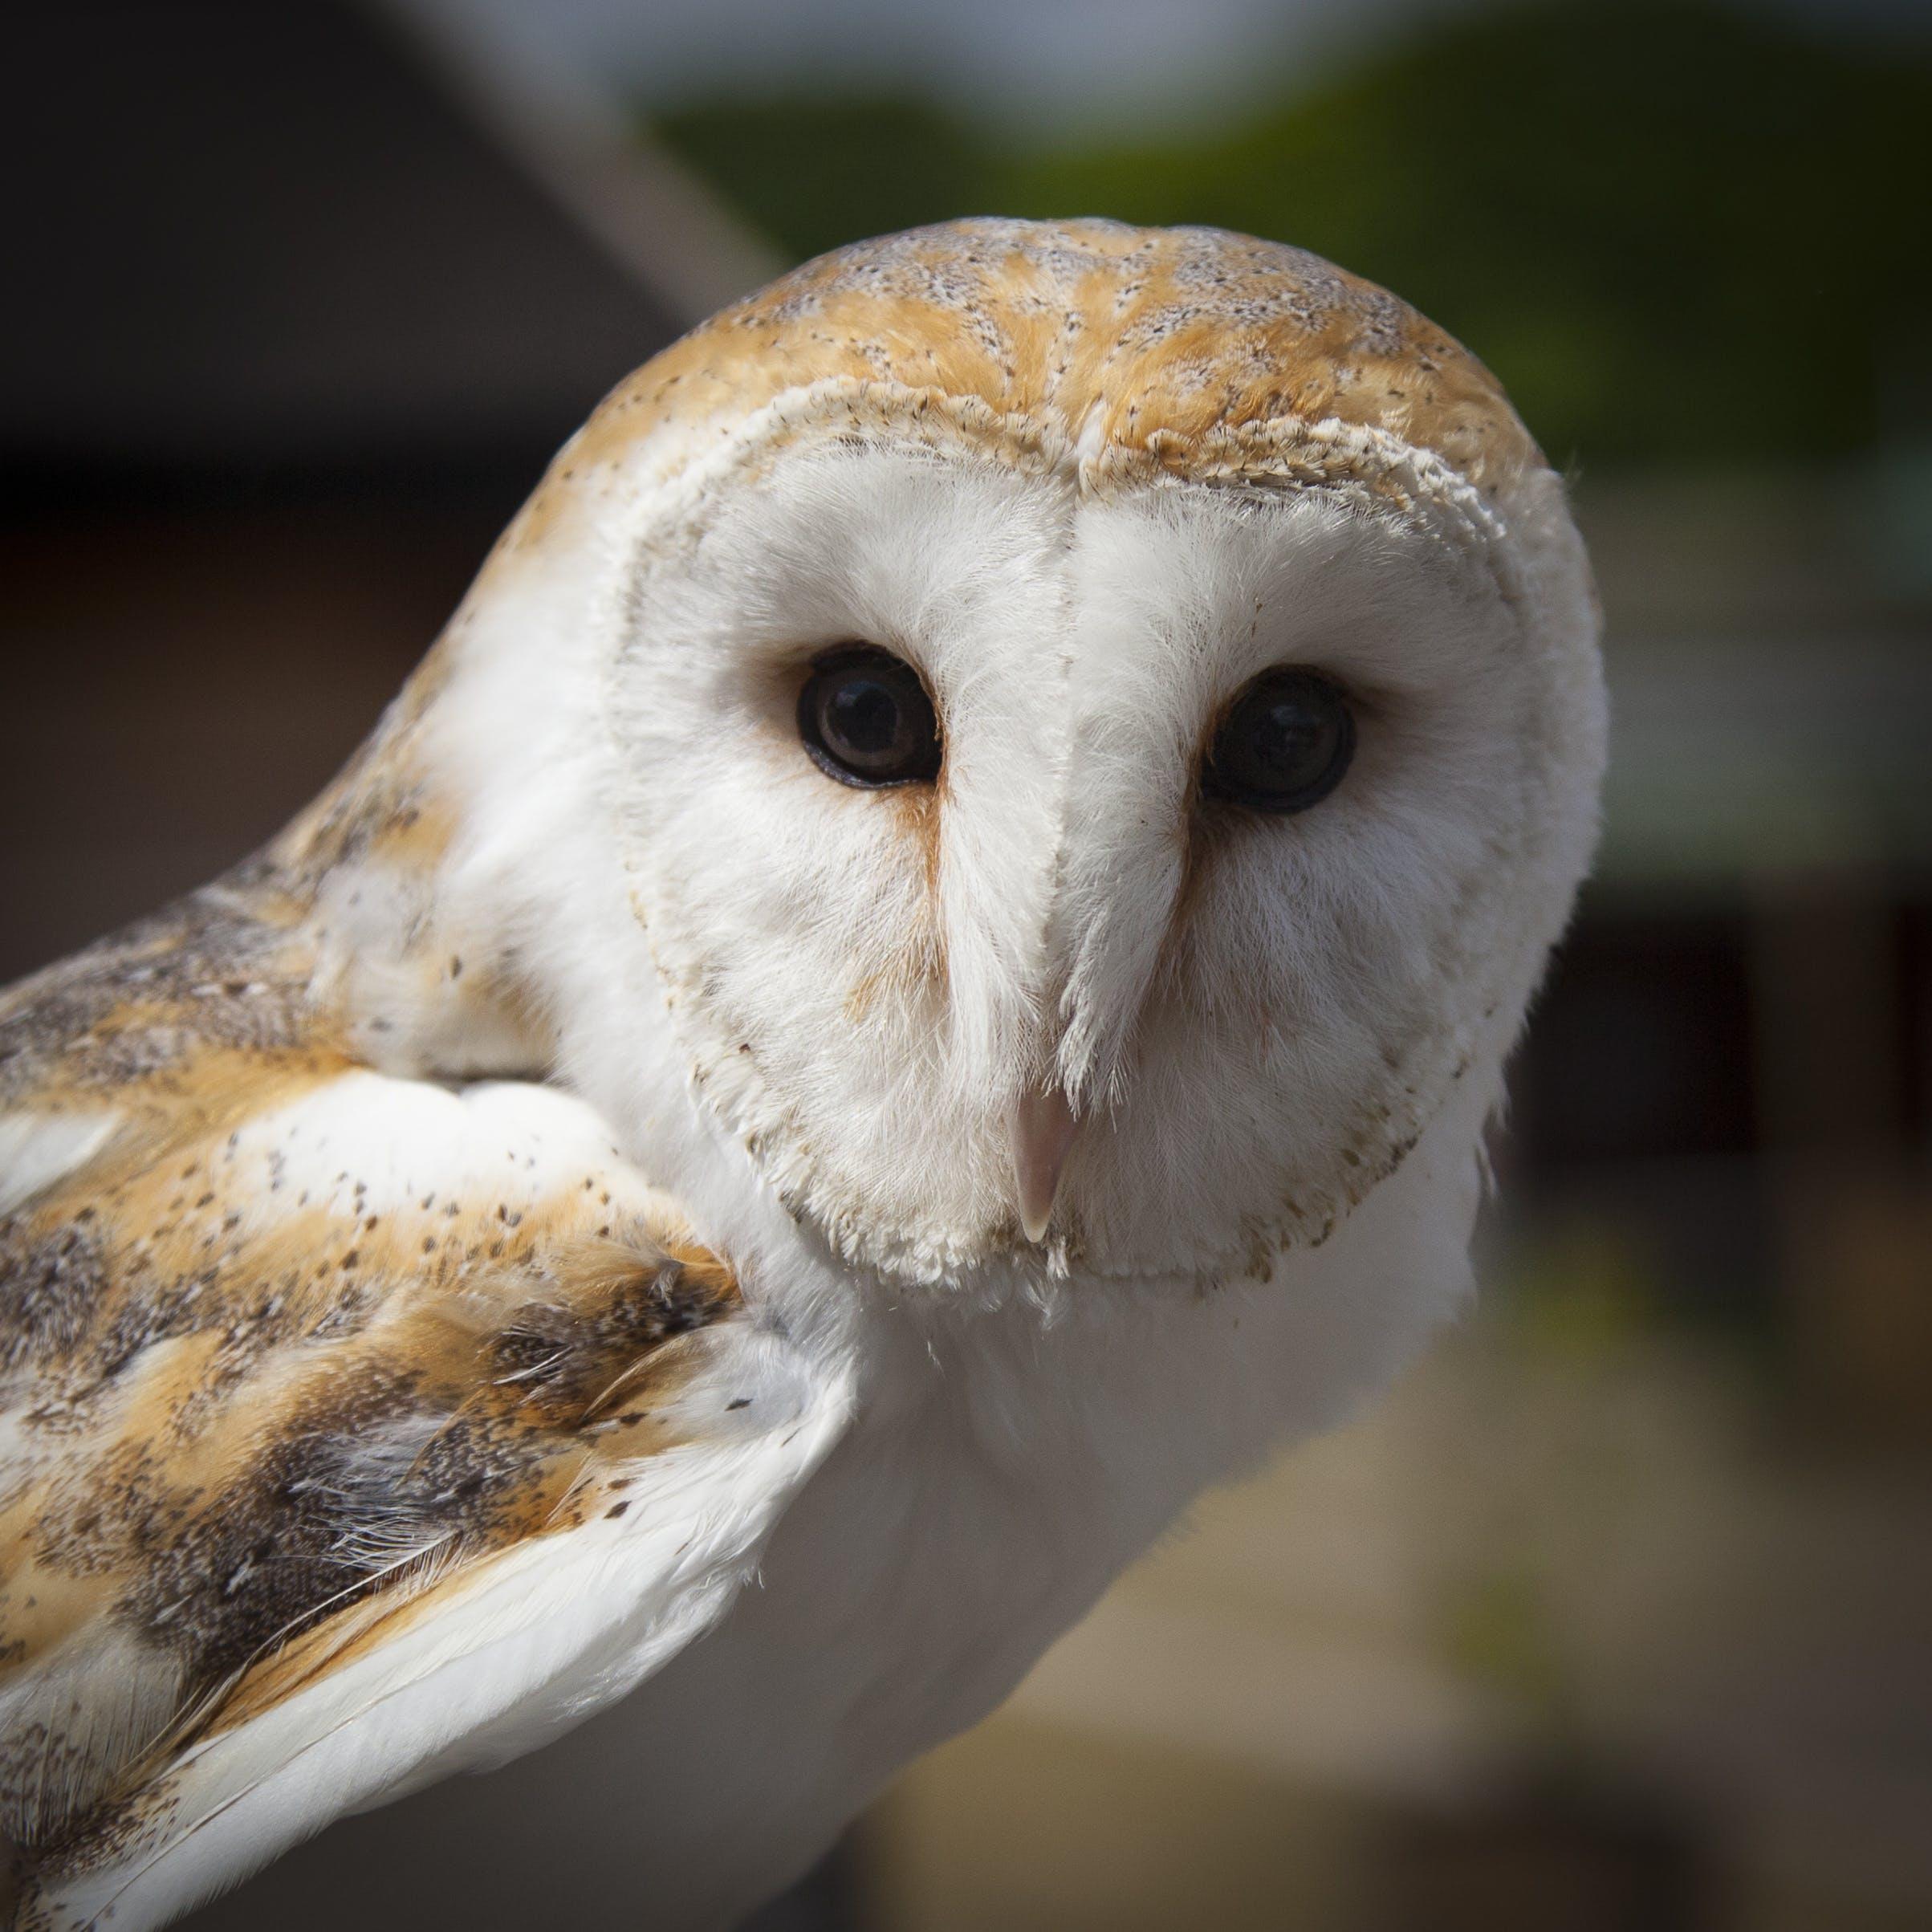 White and Brown Owl Animal